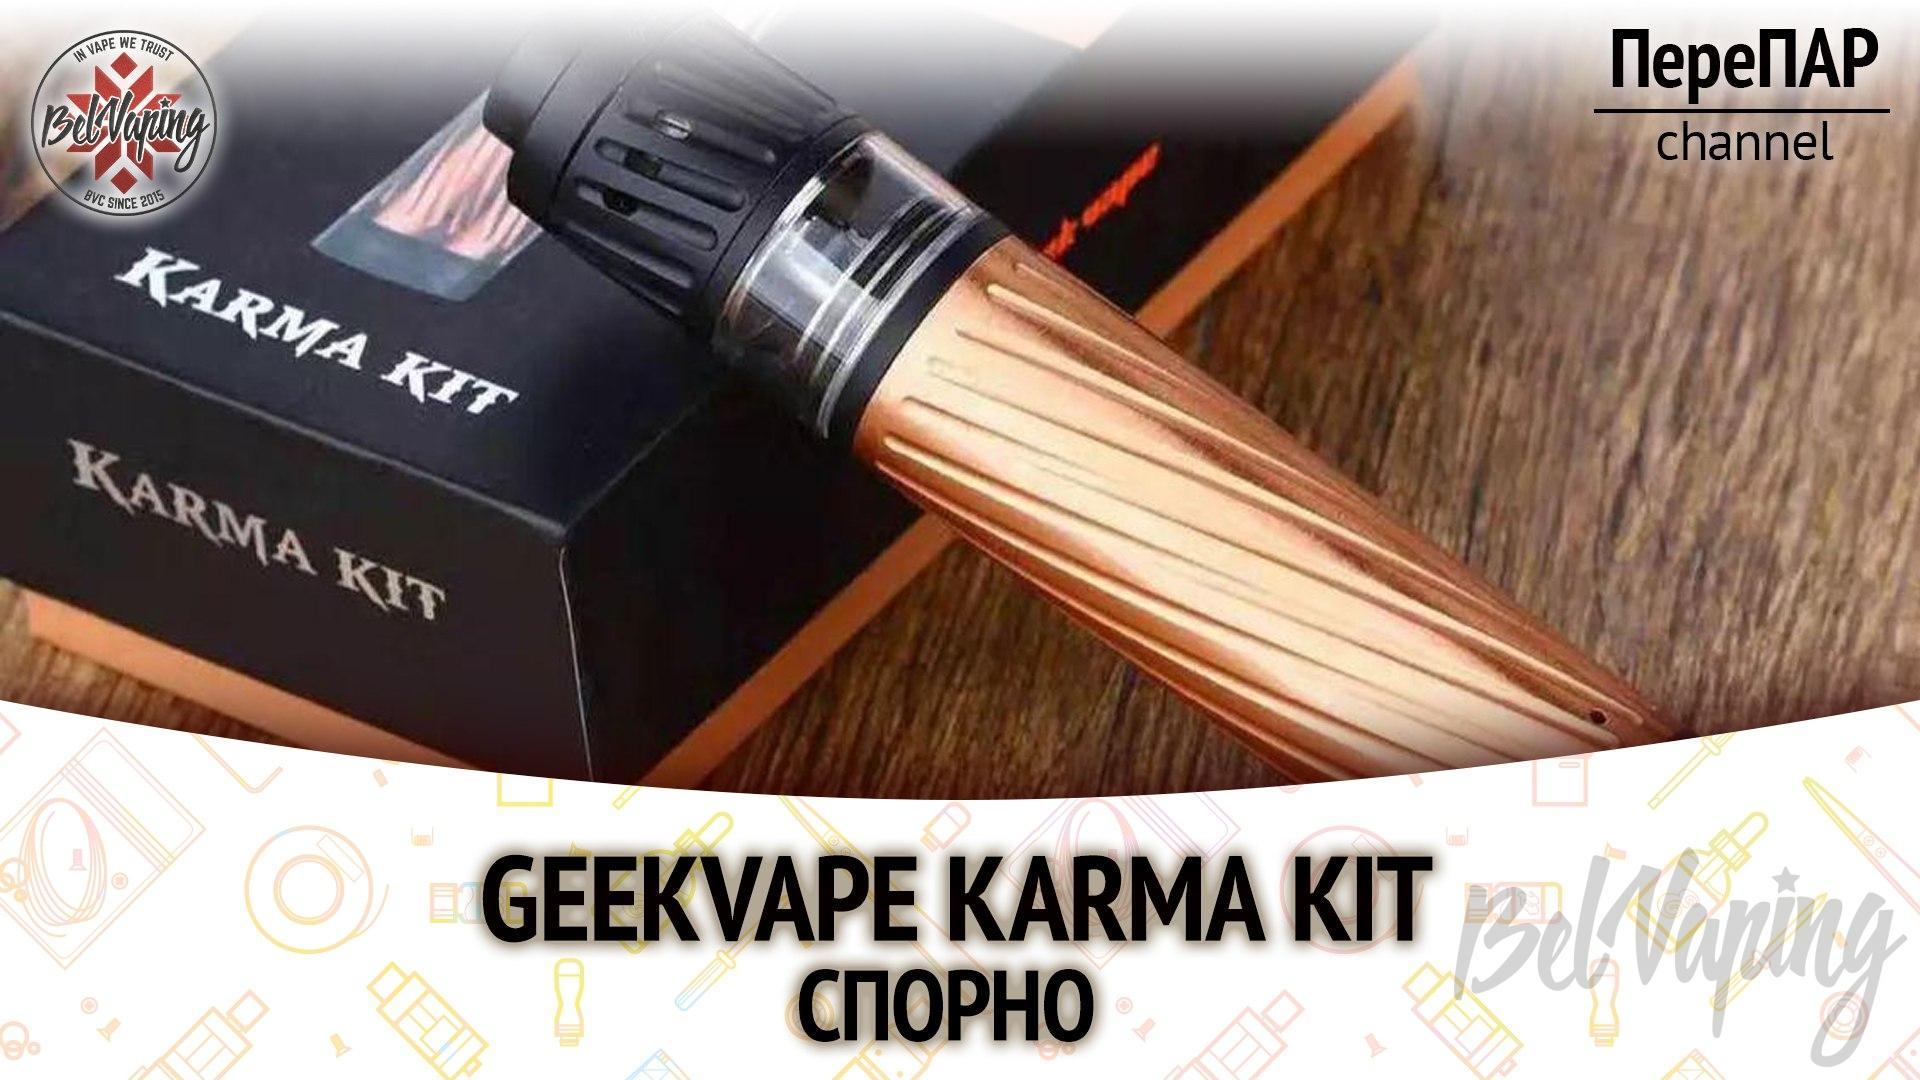 Обзор набора Geekvape Karma Kit